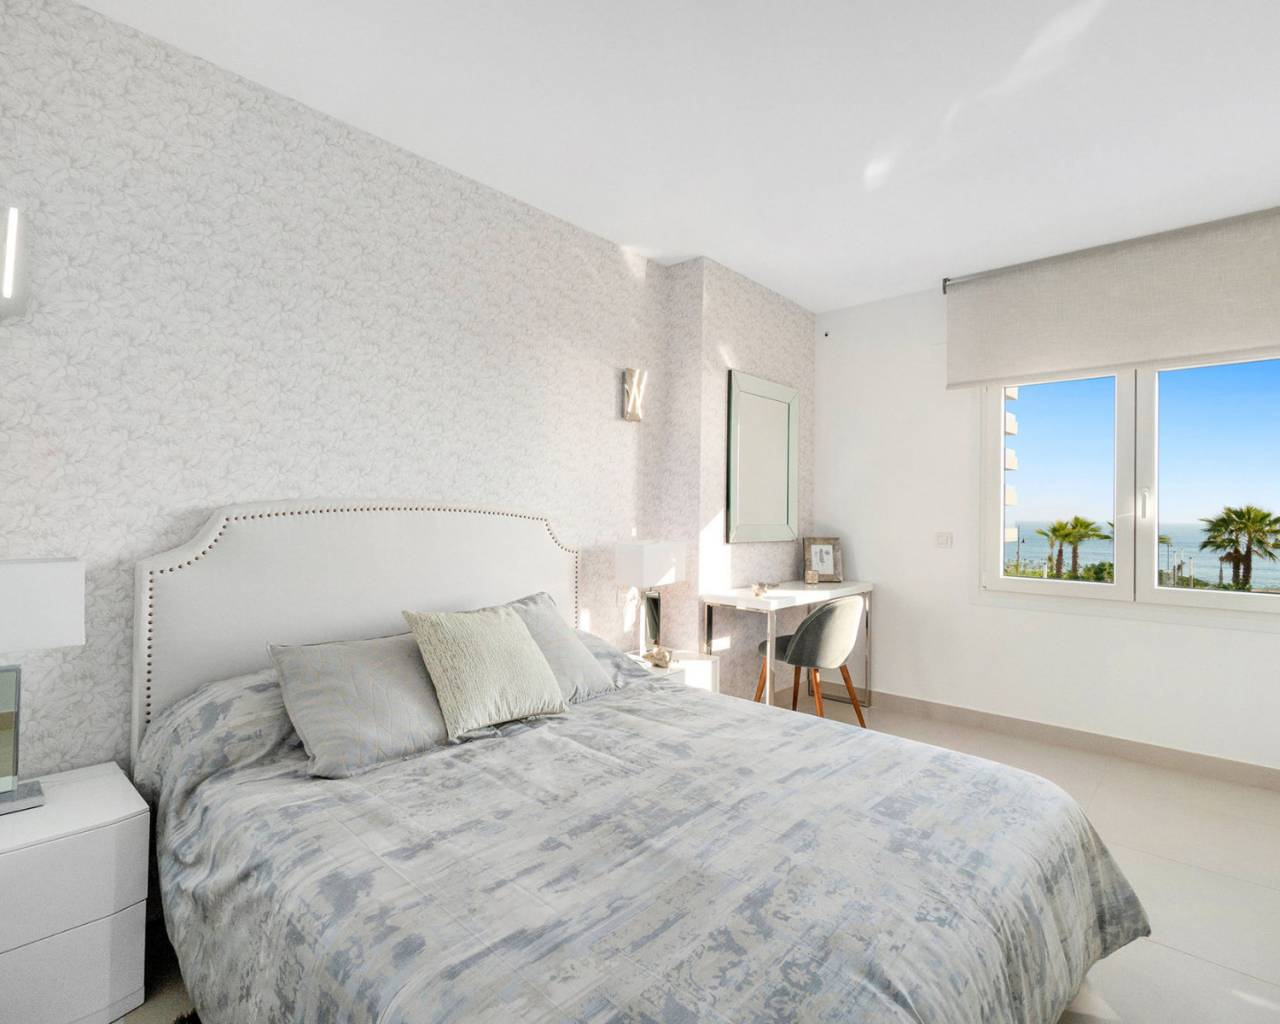 nieuwbouw-appartement-torrevieja-punta-prima_2898_xl